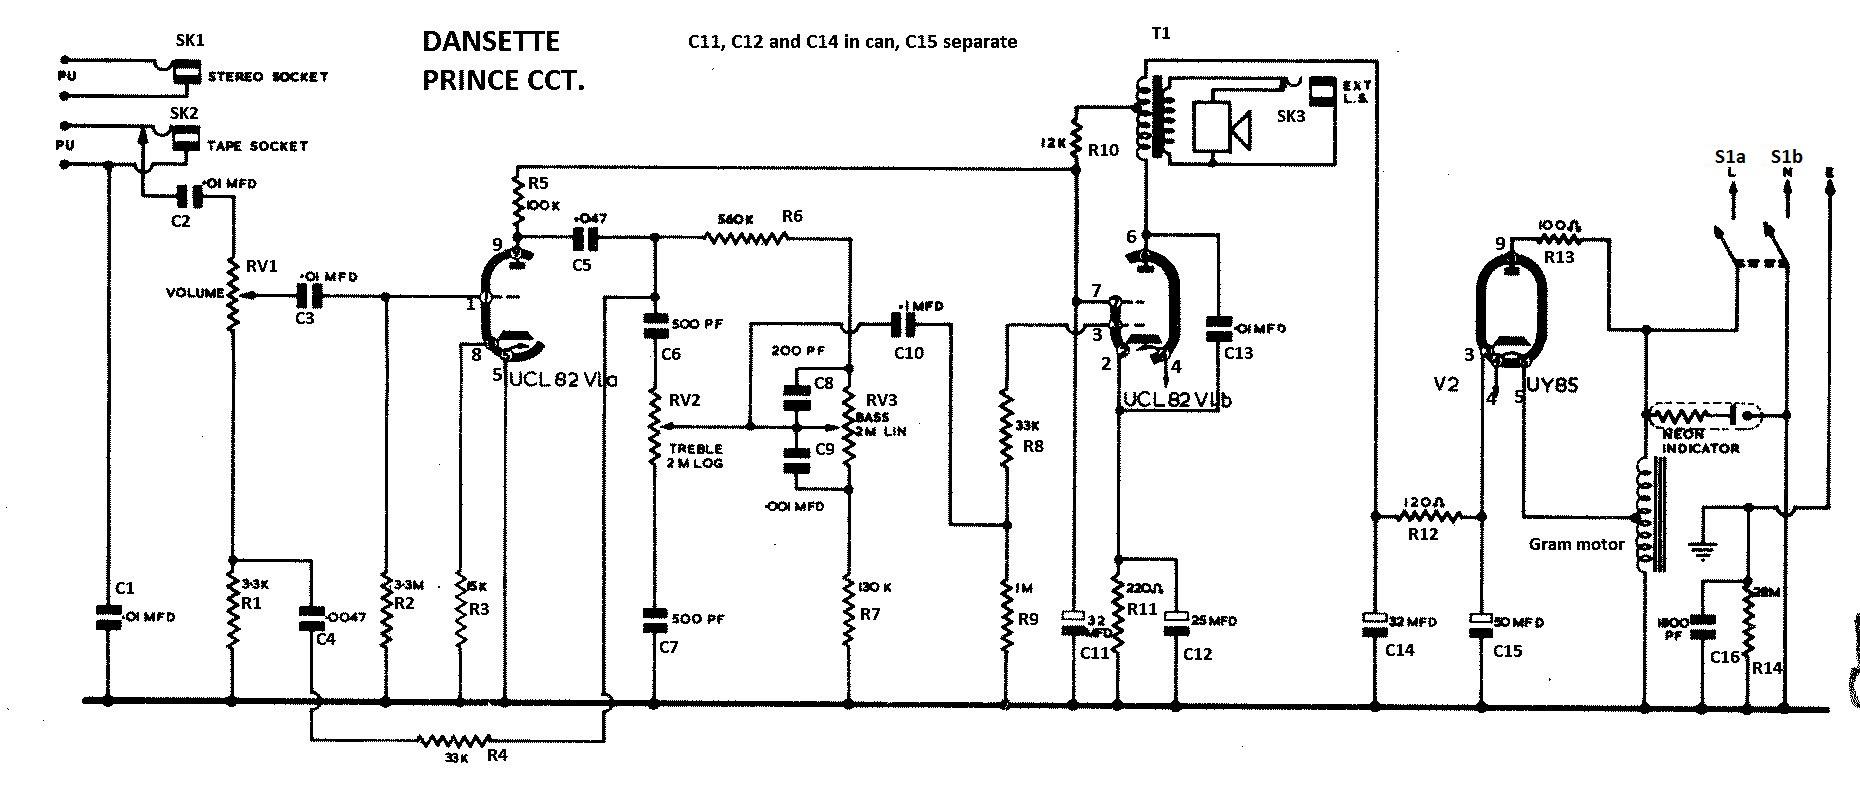 free auto wiring diagrams 1996 acura tl radio diagram manuals d - workshopradio workshop